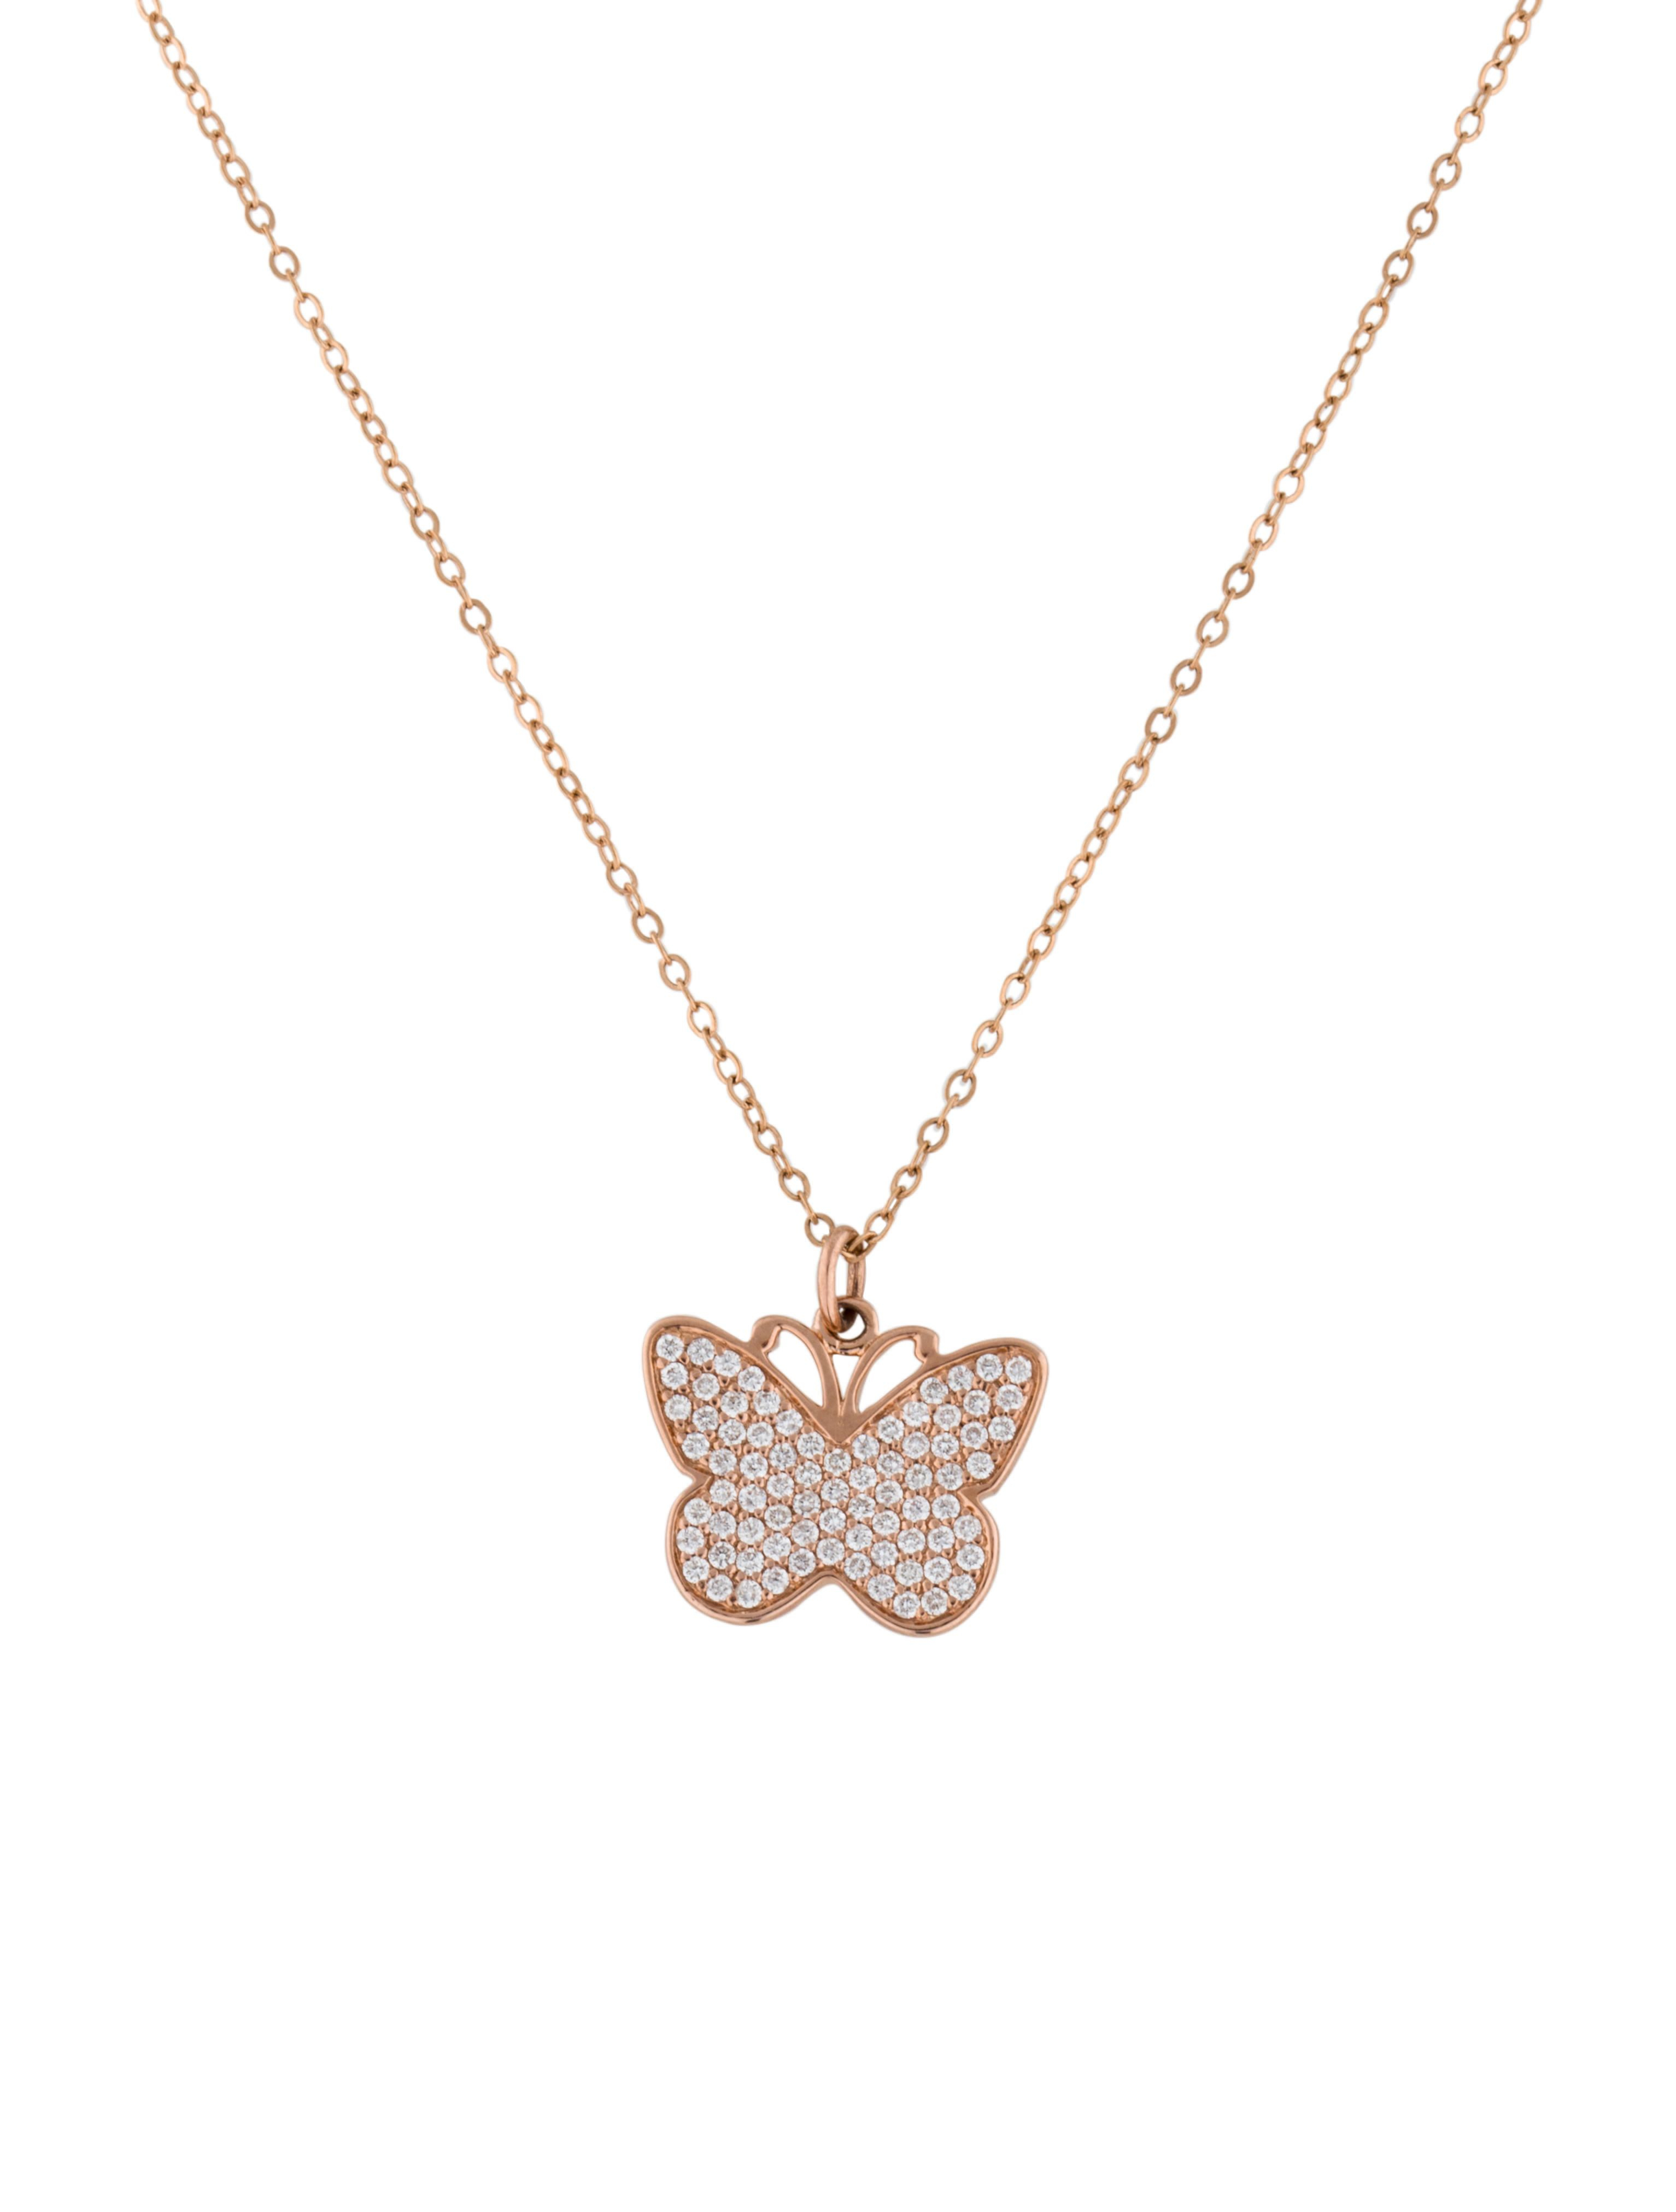 Diamond Pavé Butterfly Pendant Necklace | Prized Papillons Regarding Most Recent Pavé Butterfly Pendant Necklaces (Gallery 20 of 25)